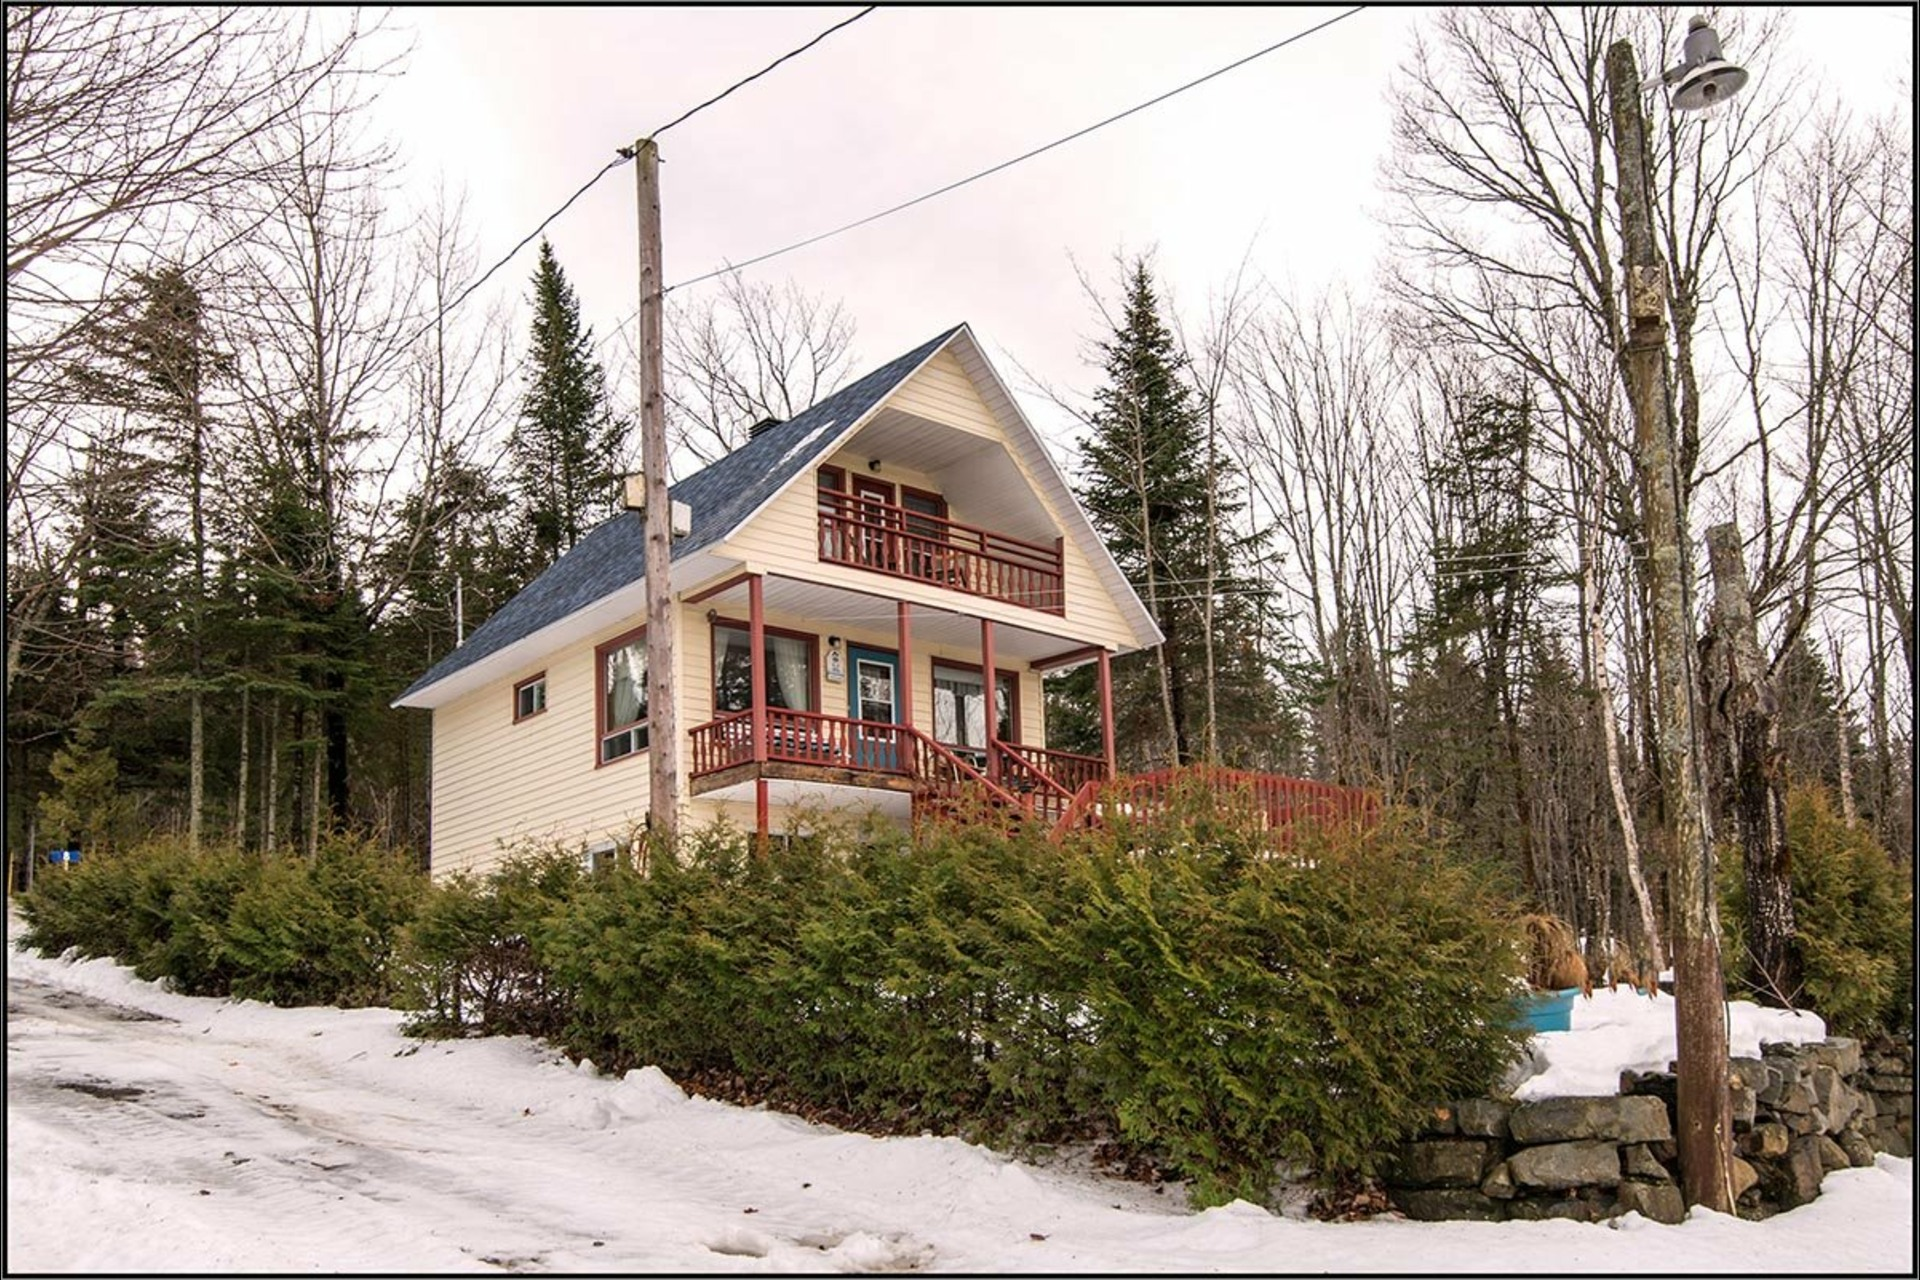 image 15 - House For sale Saint-Aubert - 6 rooms